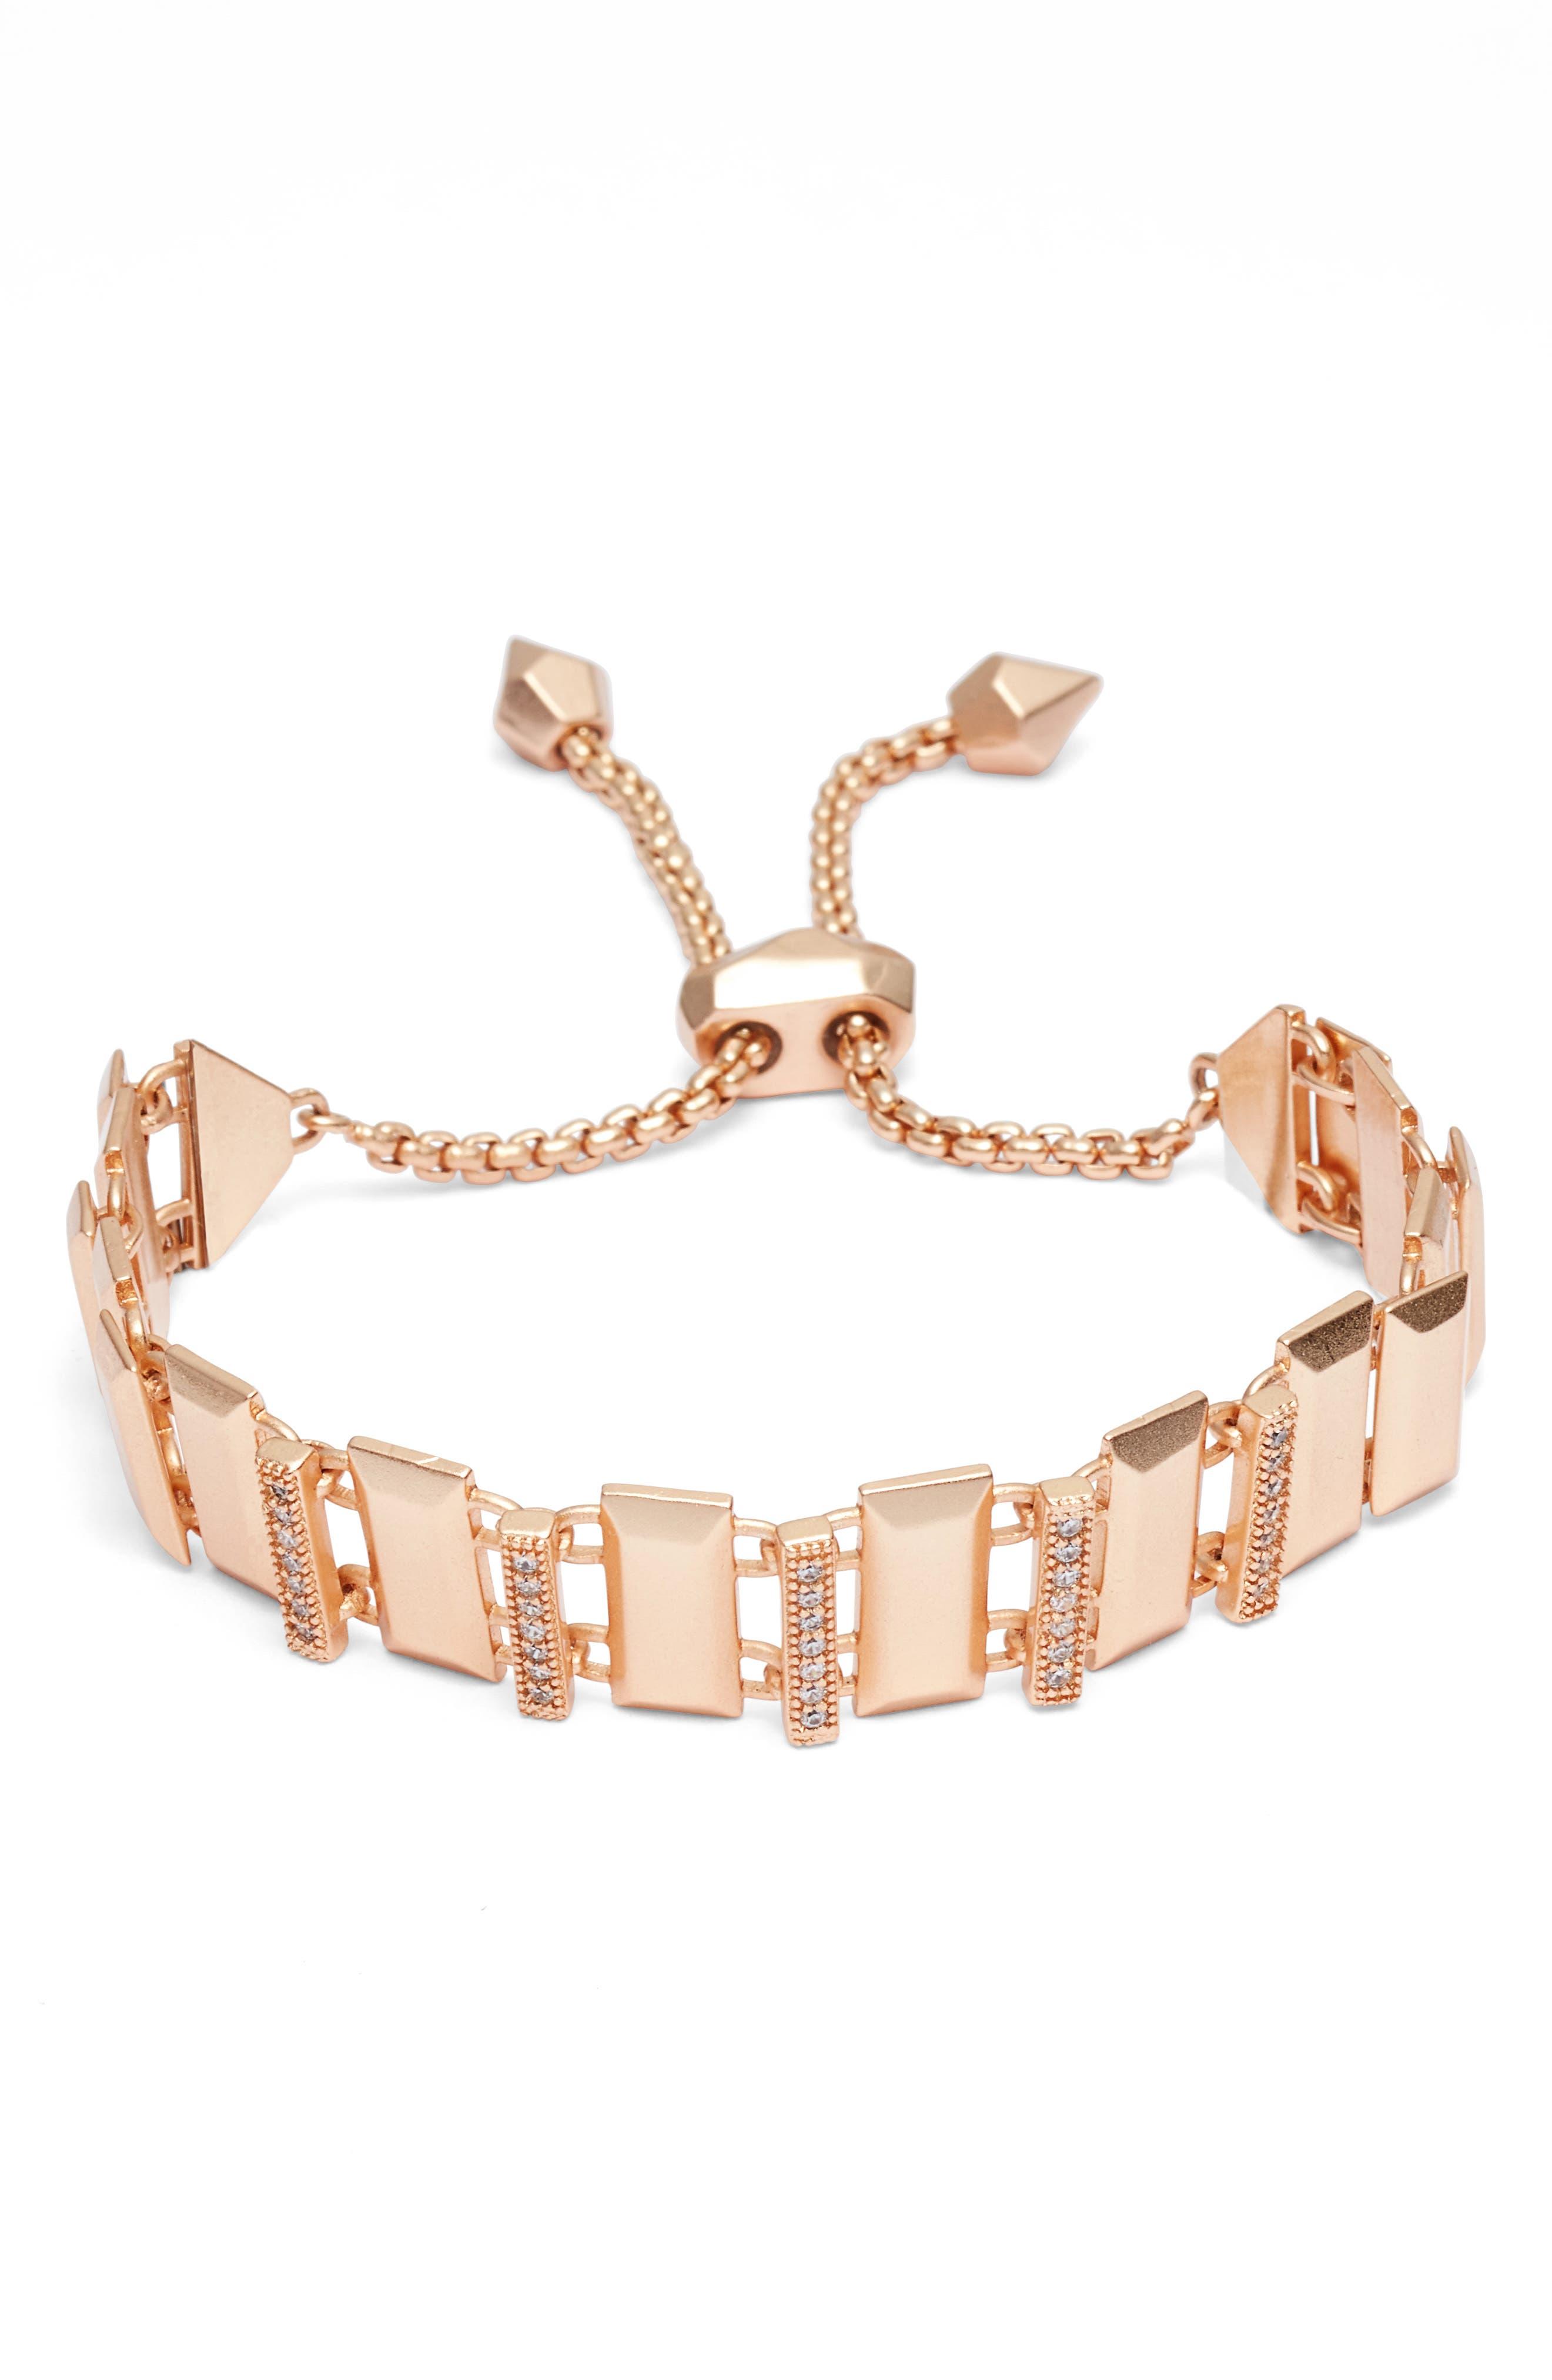 Kendra Scott Harper Friendship Bracelet